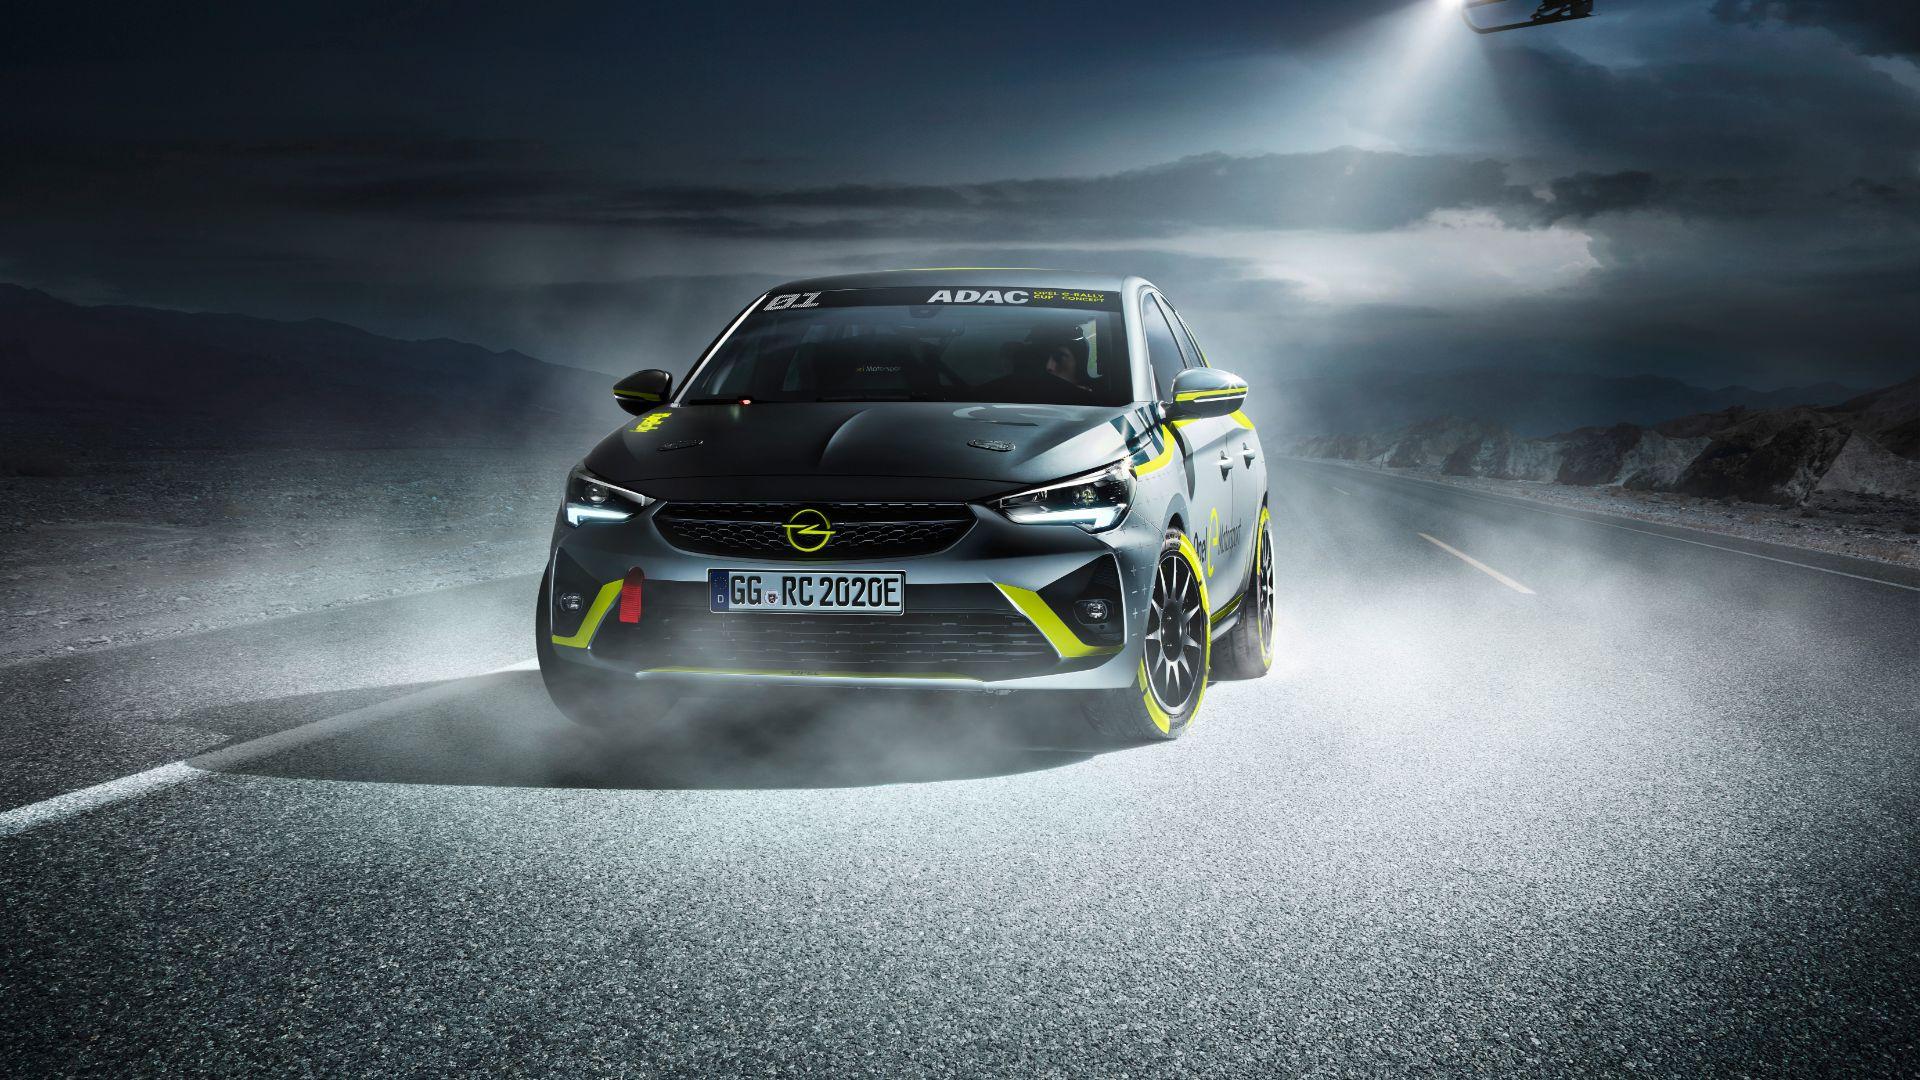 Corsa-E Rally racer debut at Frankfurt